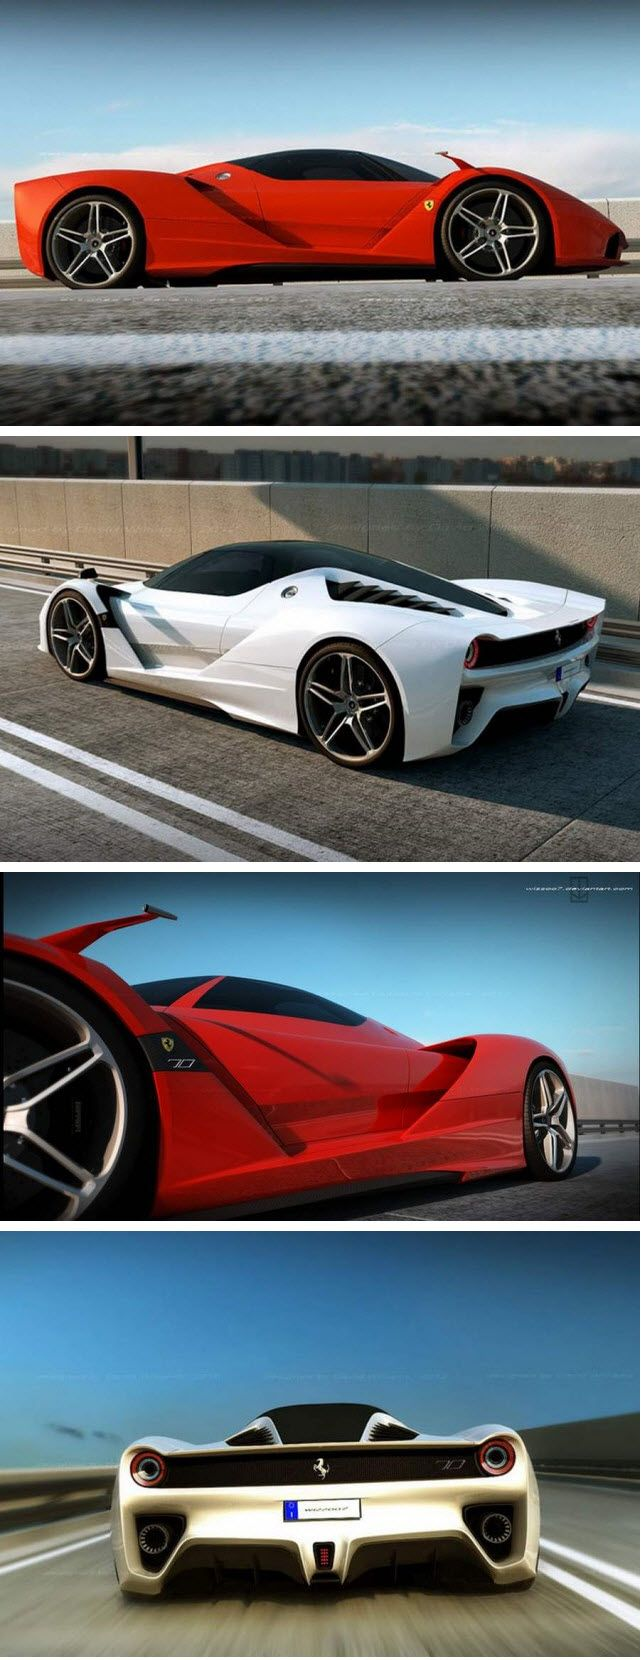 Ferrari F70 Hybrid concept